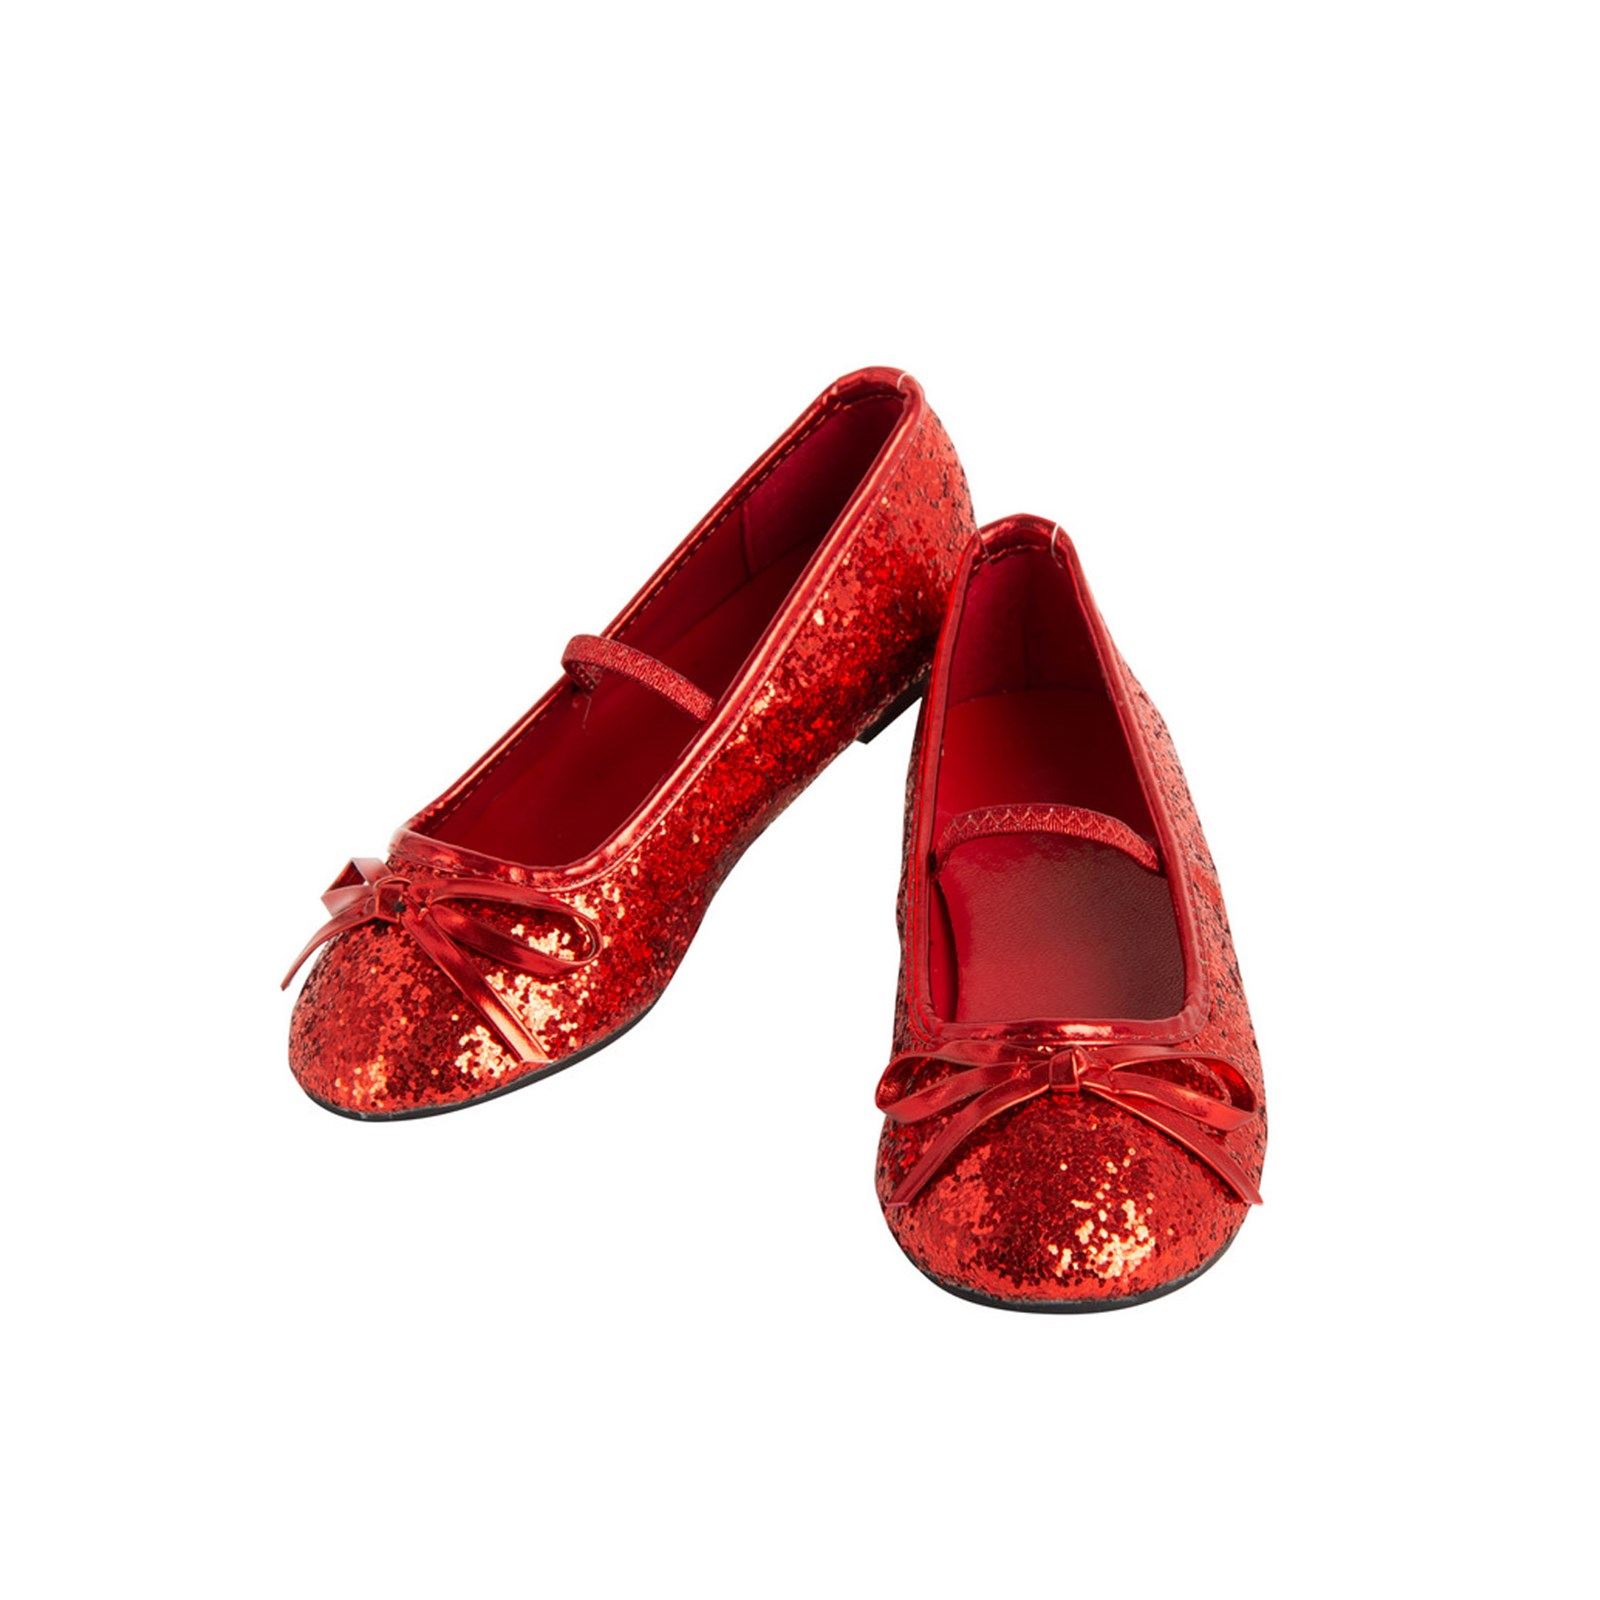 Halloween Costume Accessory Girls Ballet Shoe Red